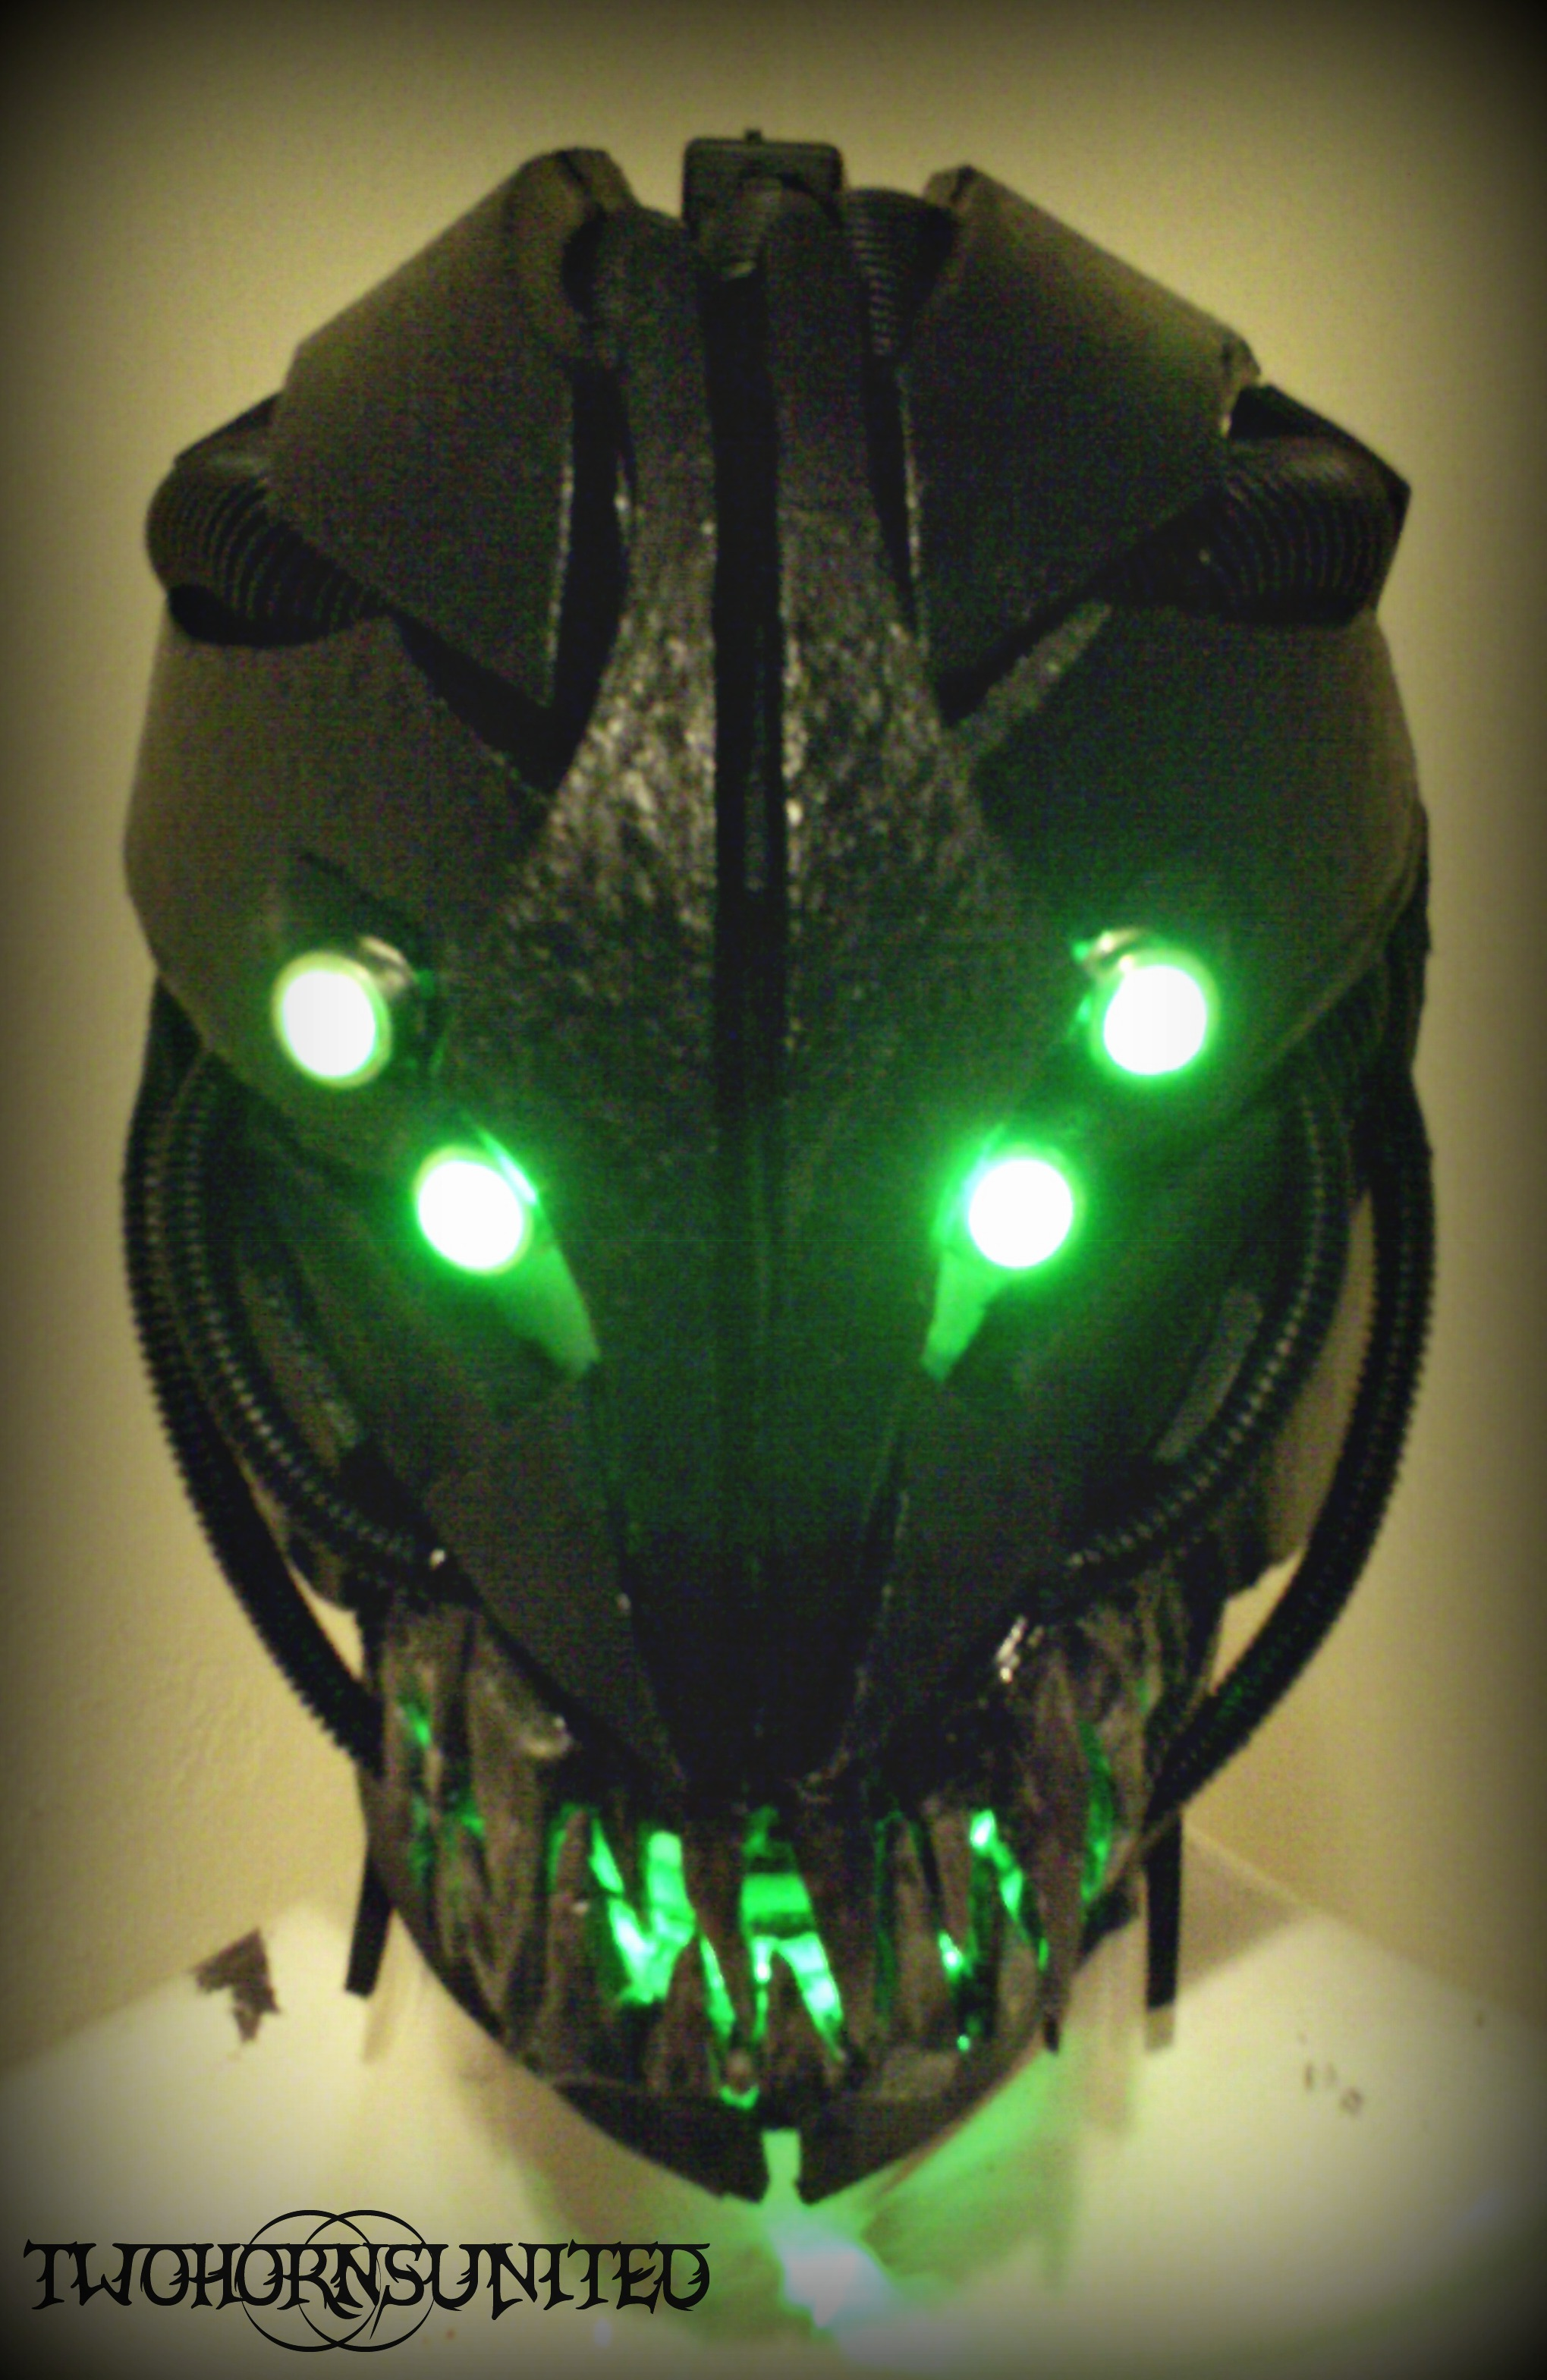 Alien masks for sale they live alien mask for sale the gurath